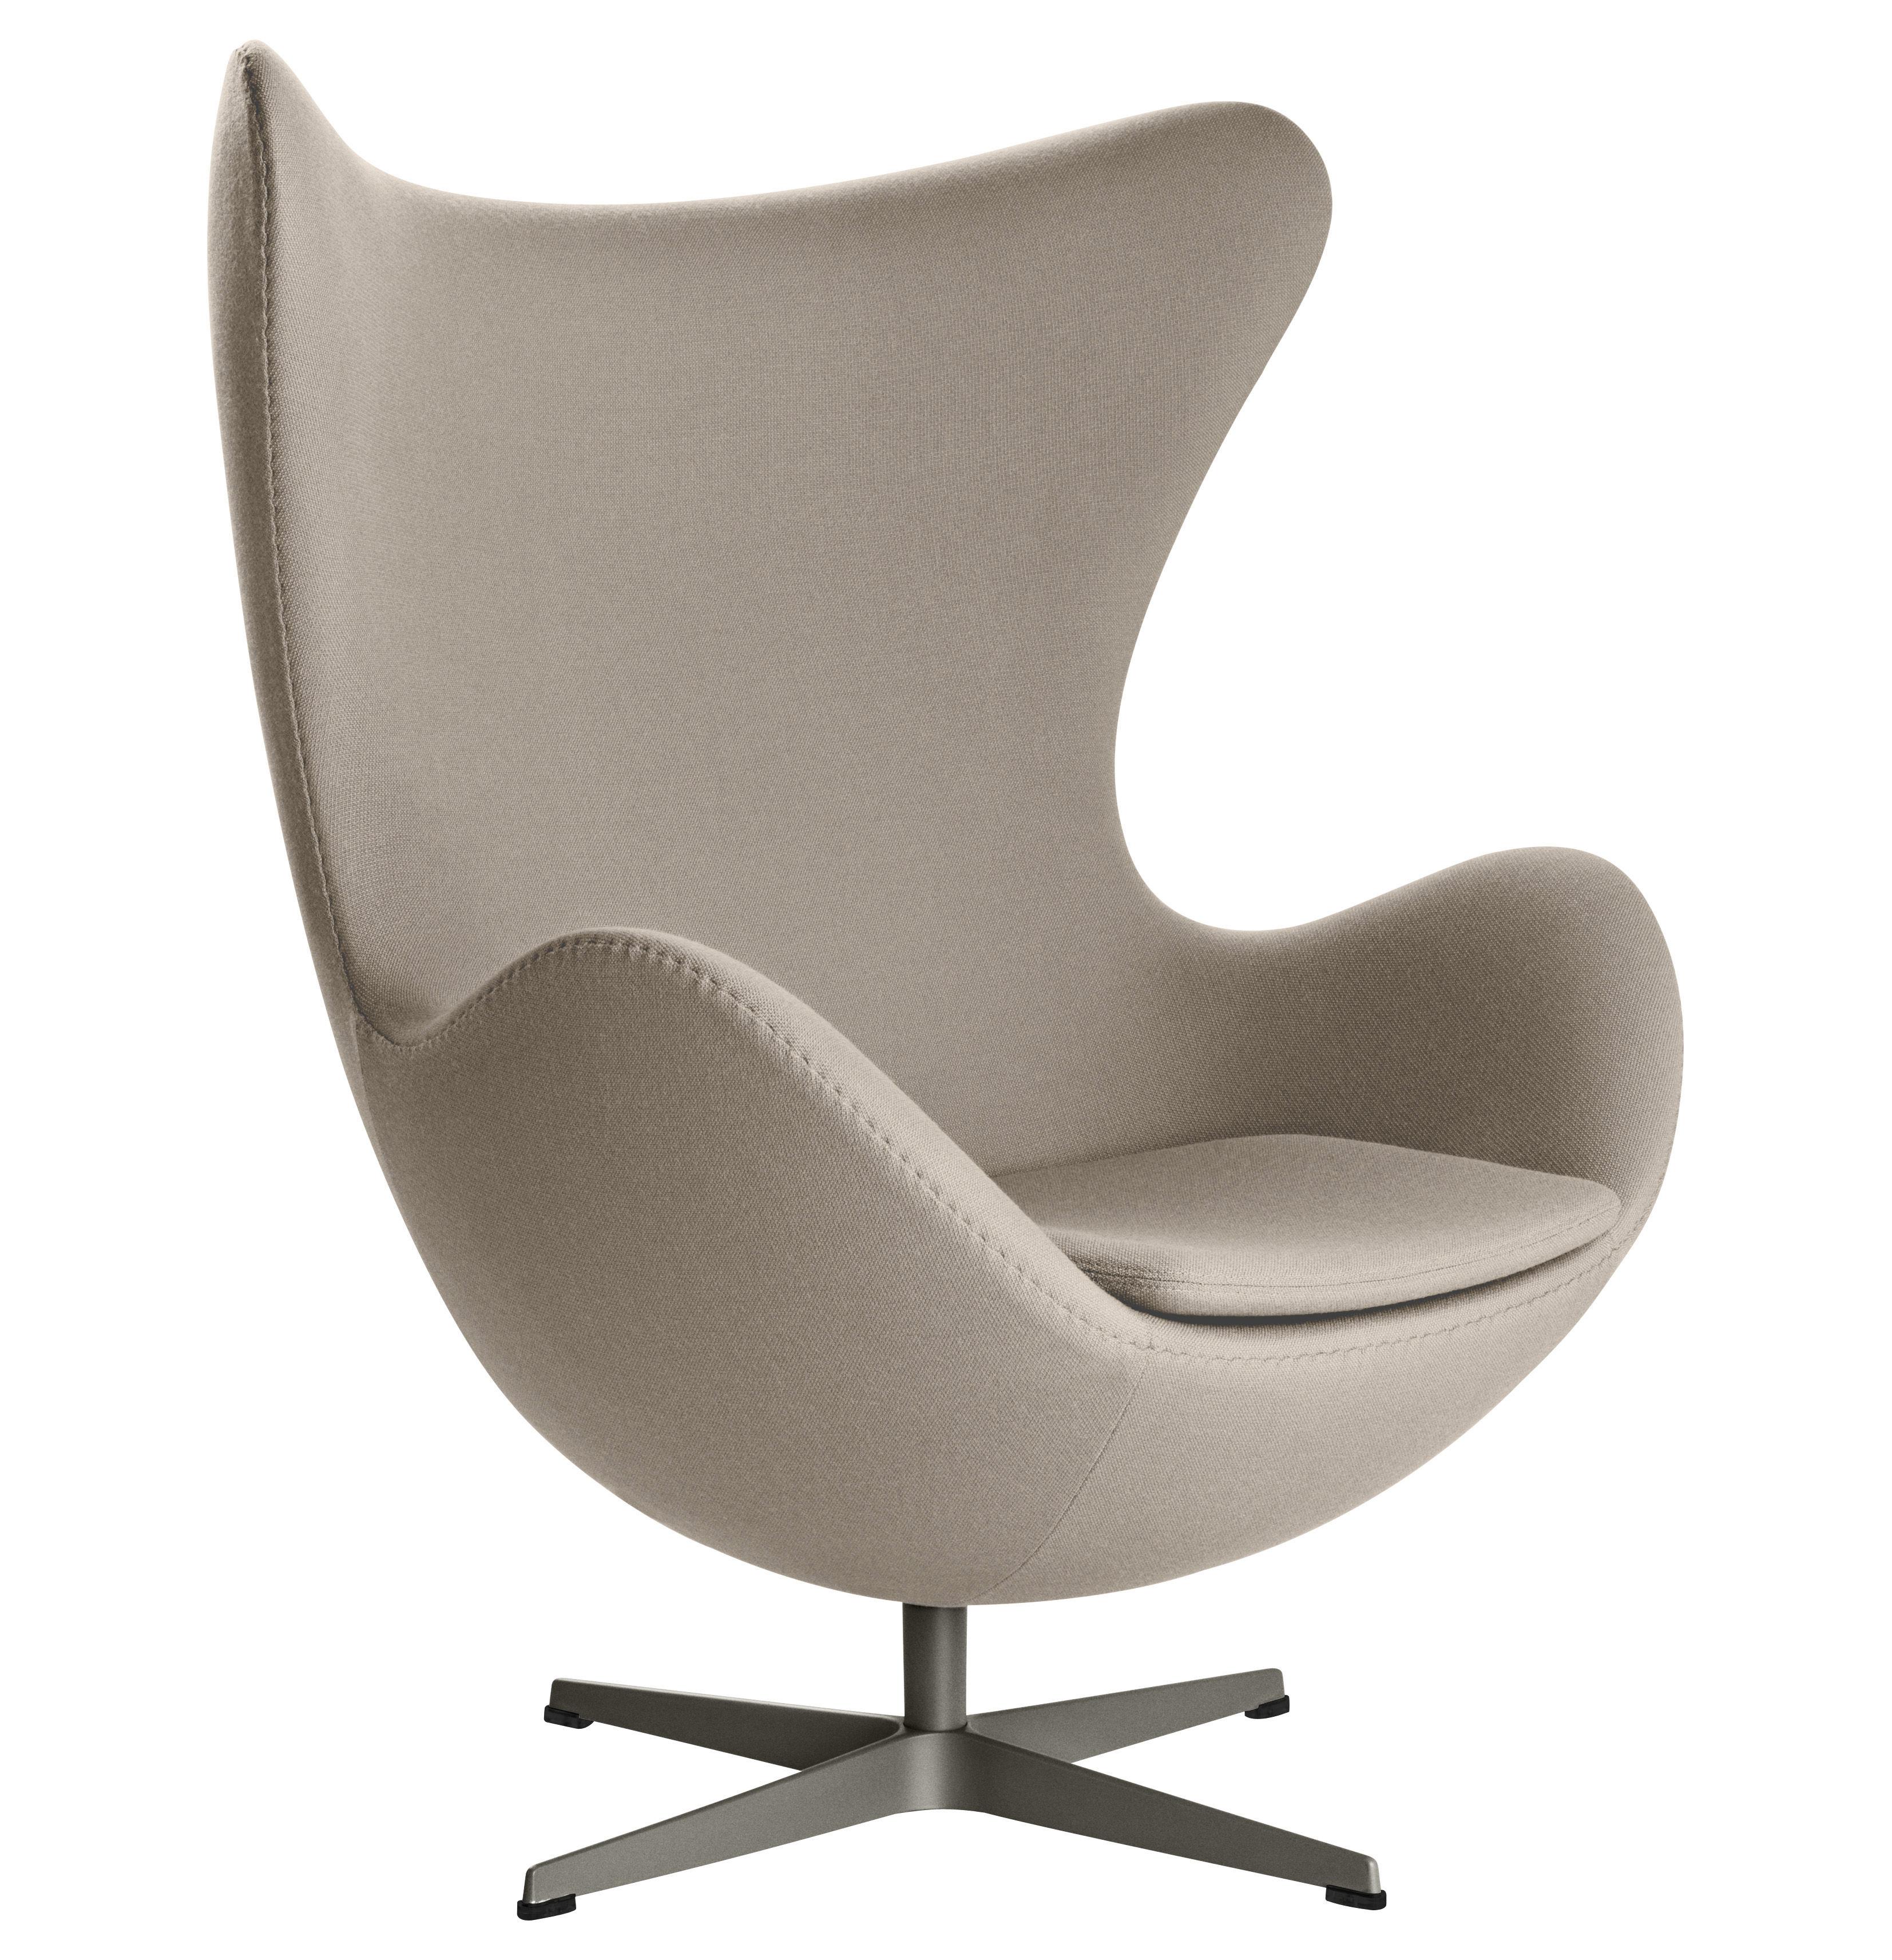 Möbel - Lounge Sessel - Egg chair Drehsessel Stoff - Fritz Hansen - Taupe - Gewebe, Glasfaser, poliertes Aluminium, Polyurethan-Schaum